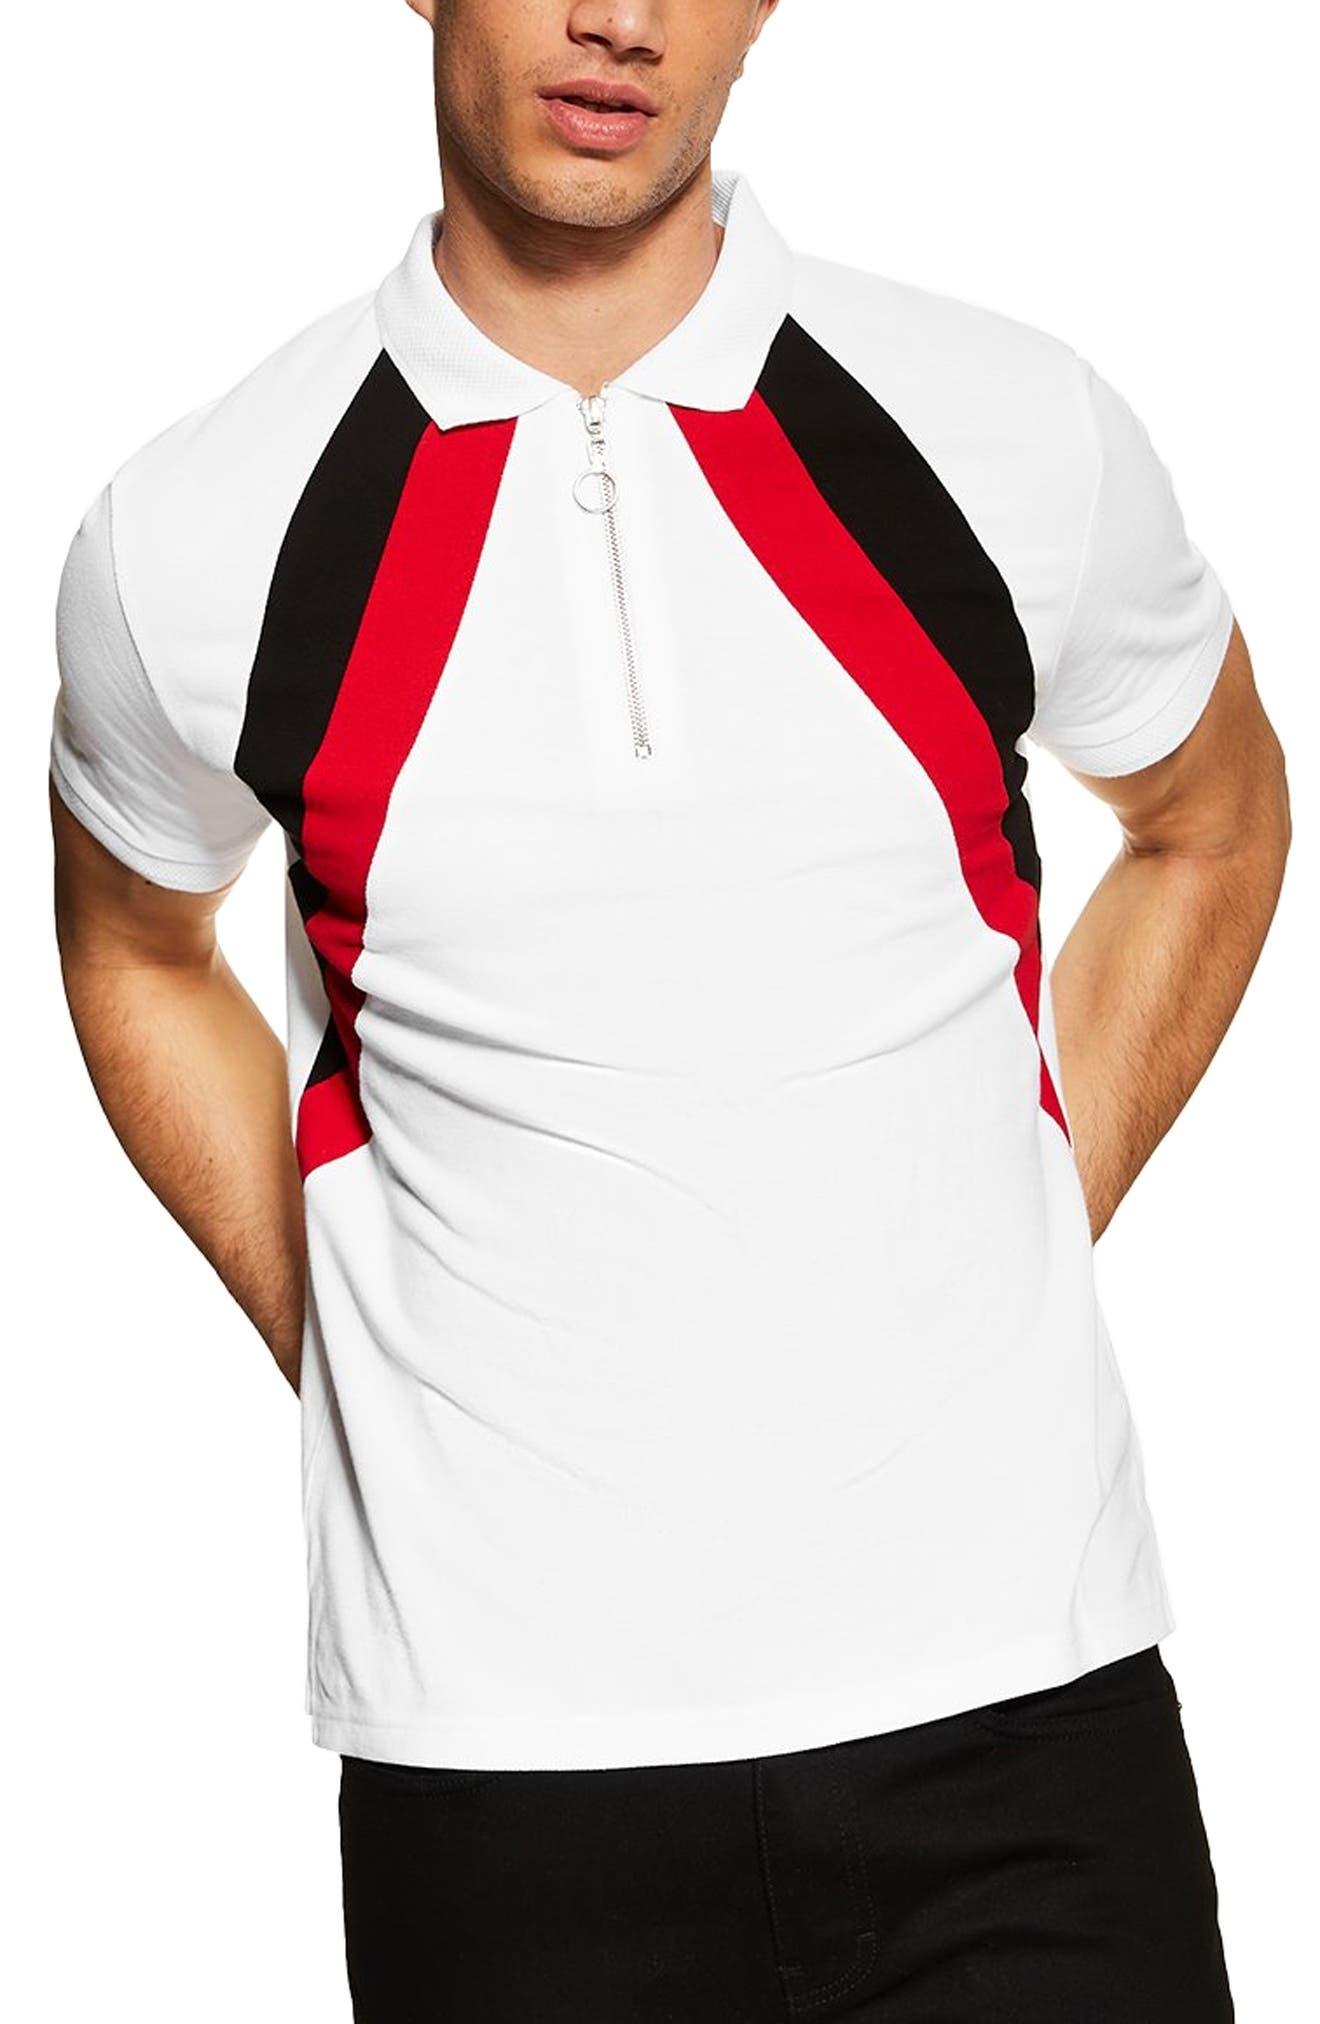 TOPMAN Stripe Zip Polo, Main, color, WHITE